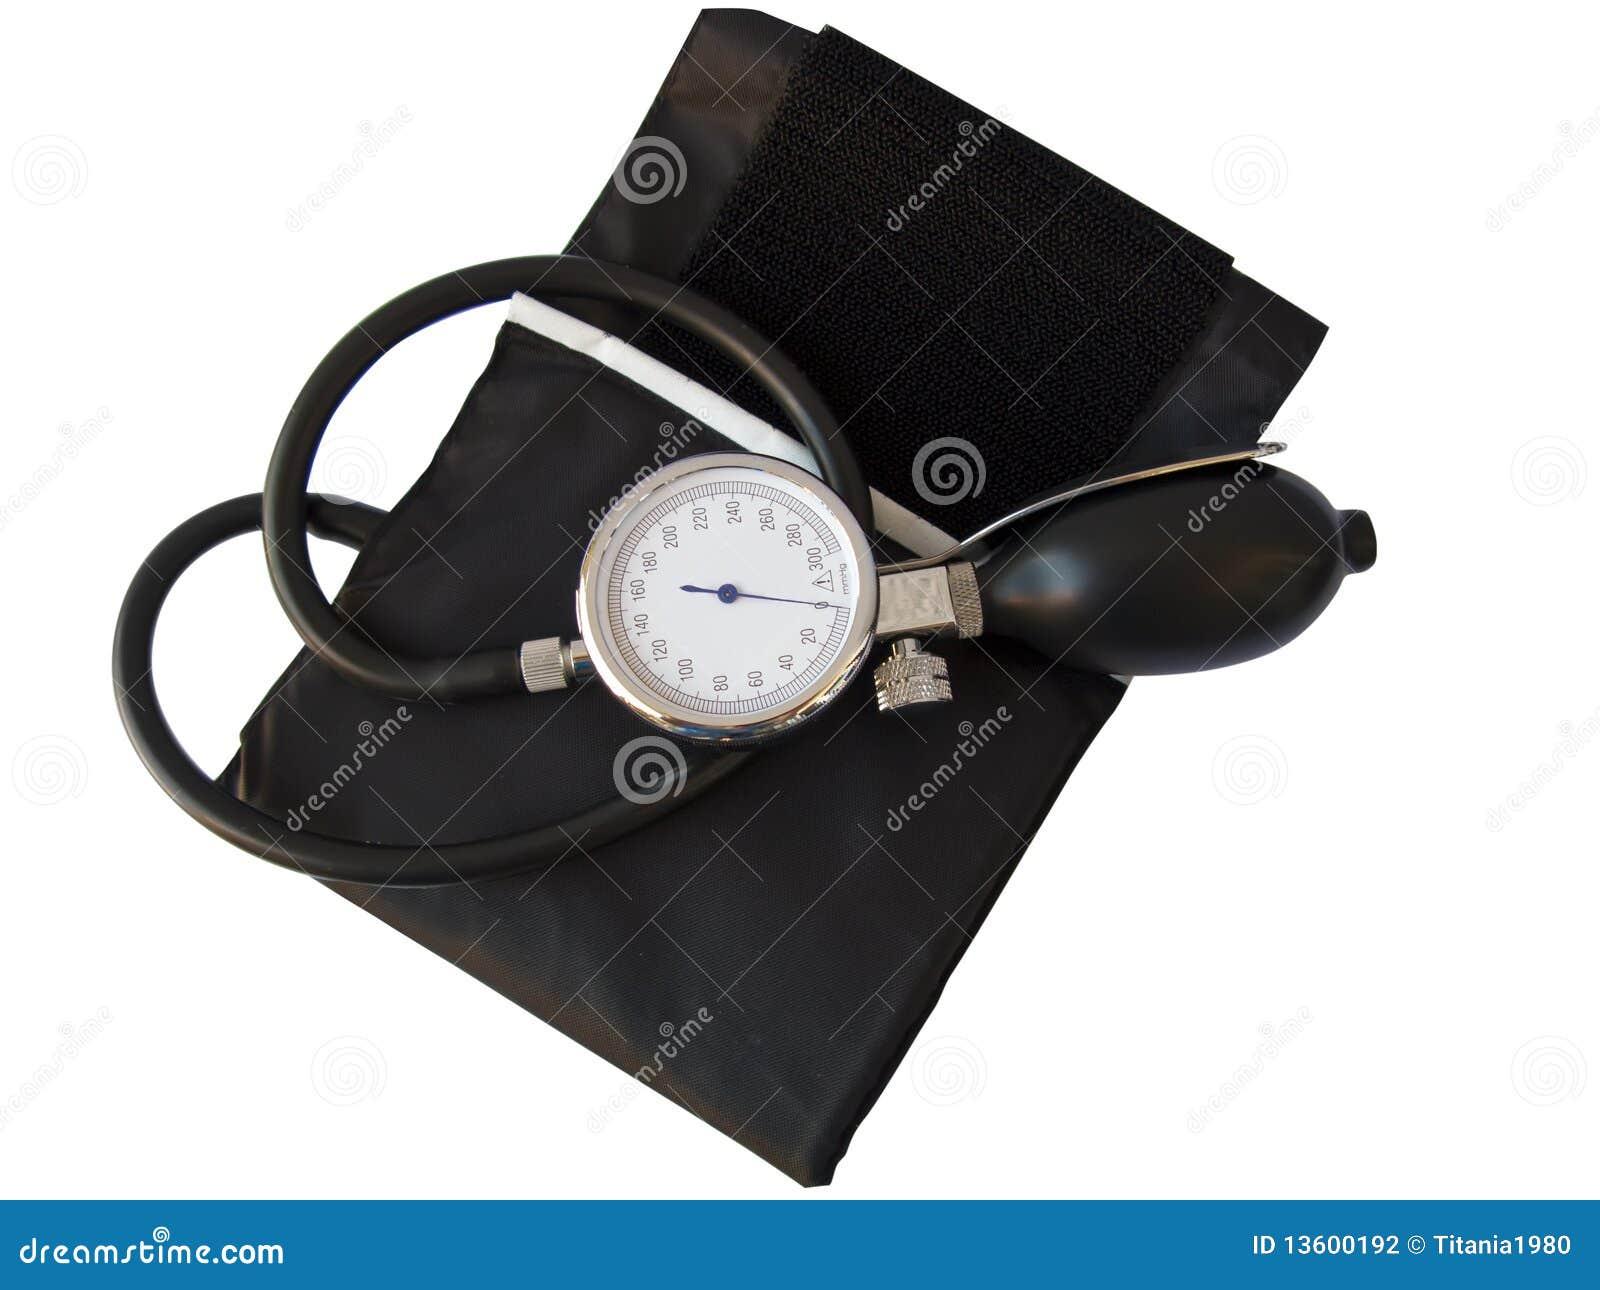 Blood pressure sphygmomanometer,clipping path